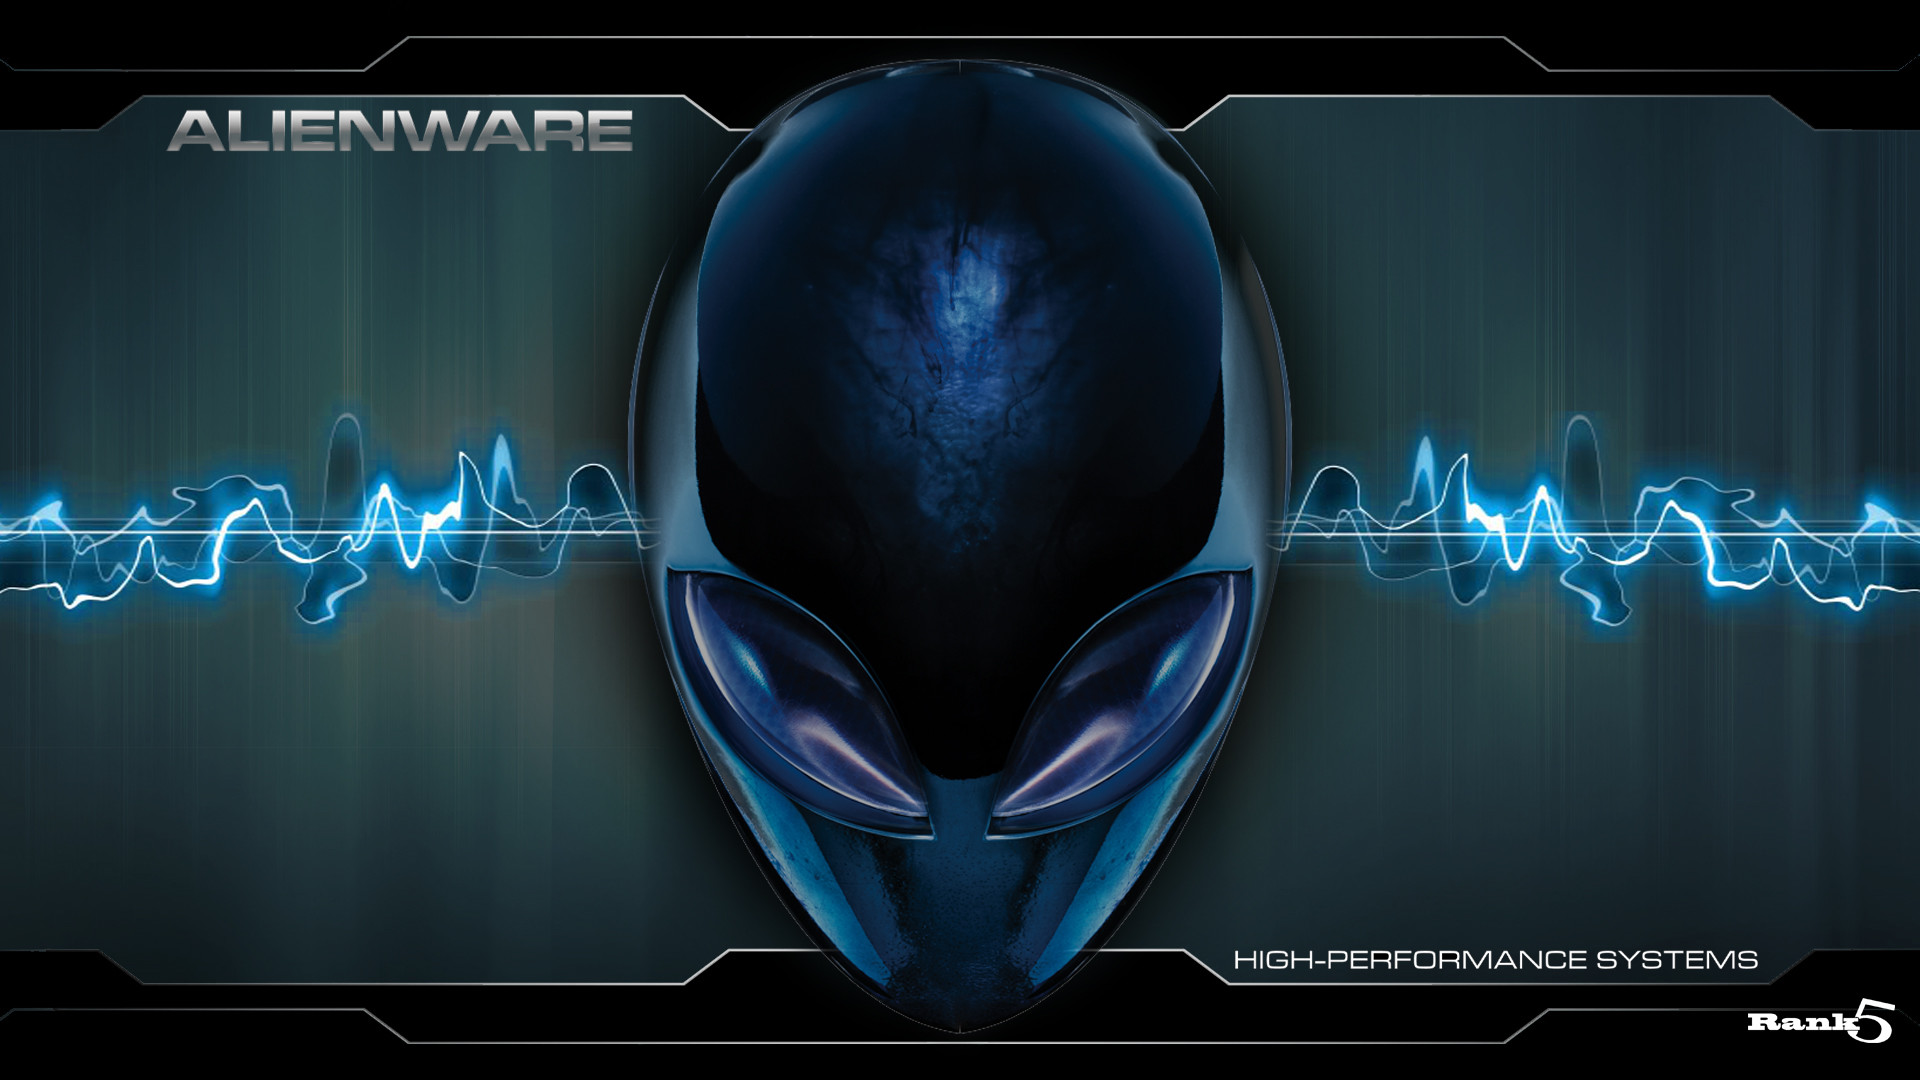 Alienware wallpapers for windows 7 wallpapersafari - 1920x1080